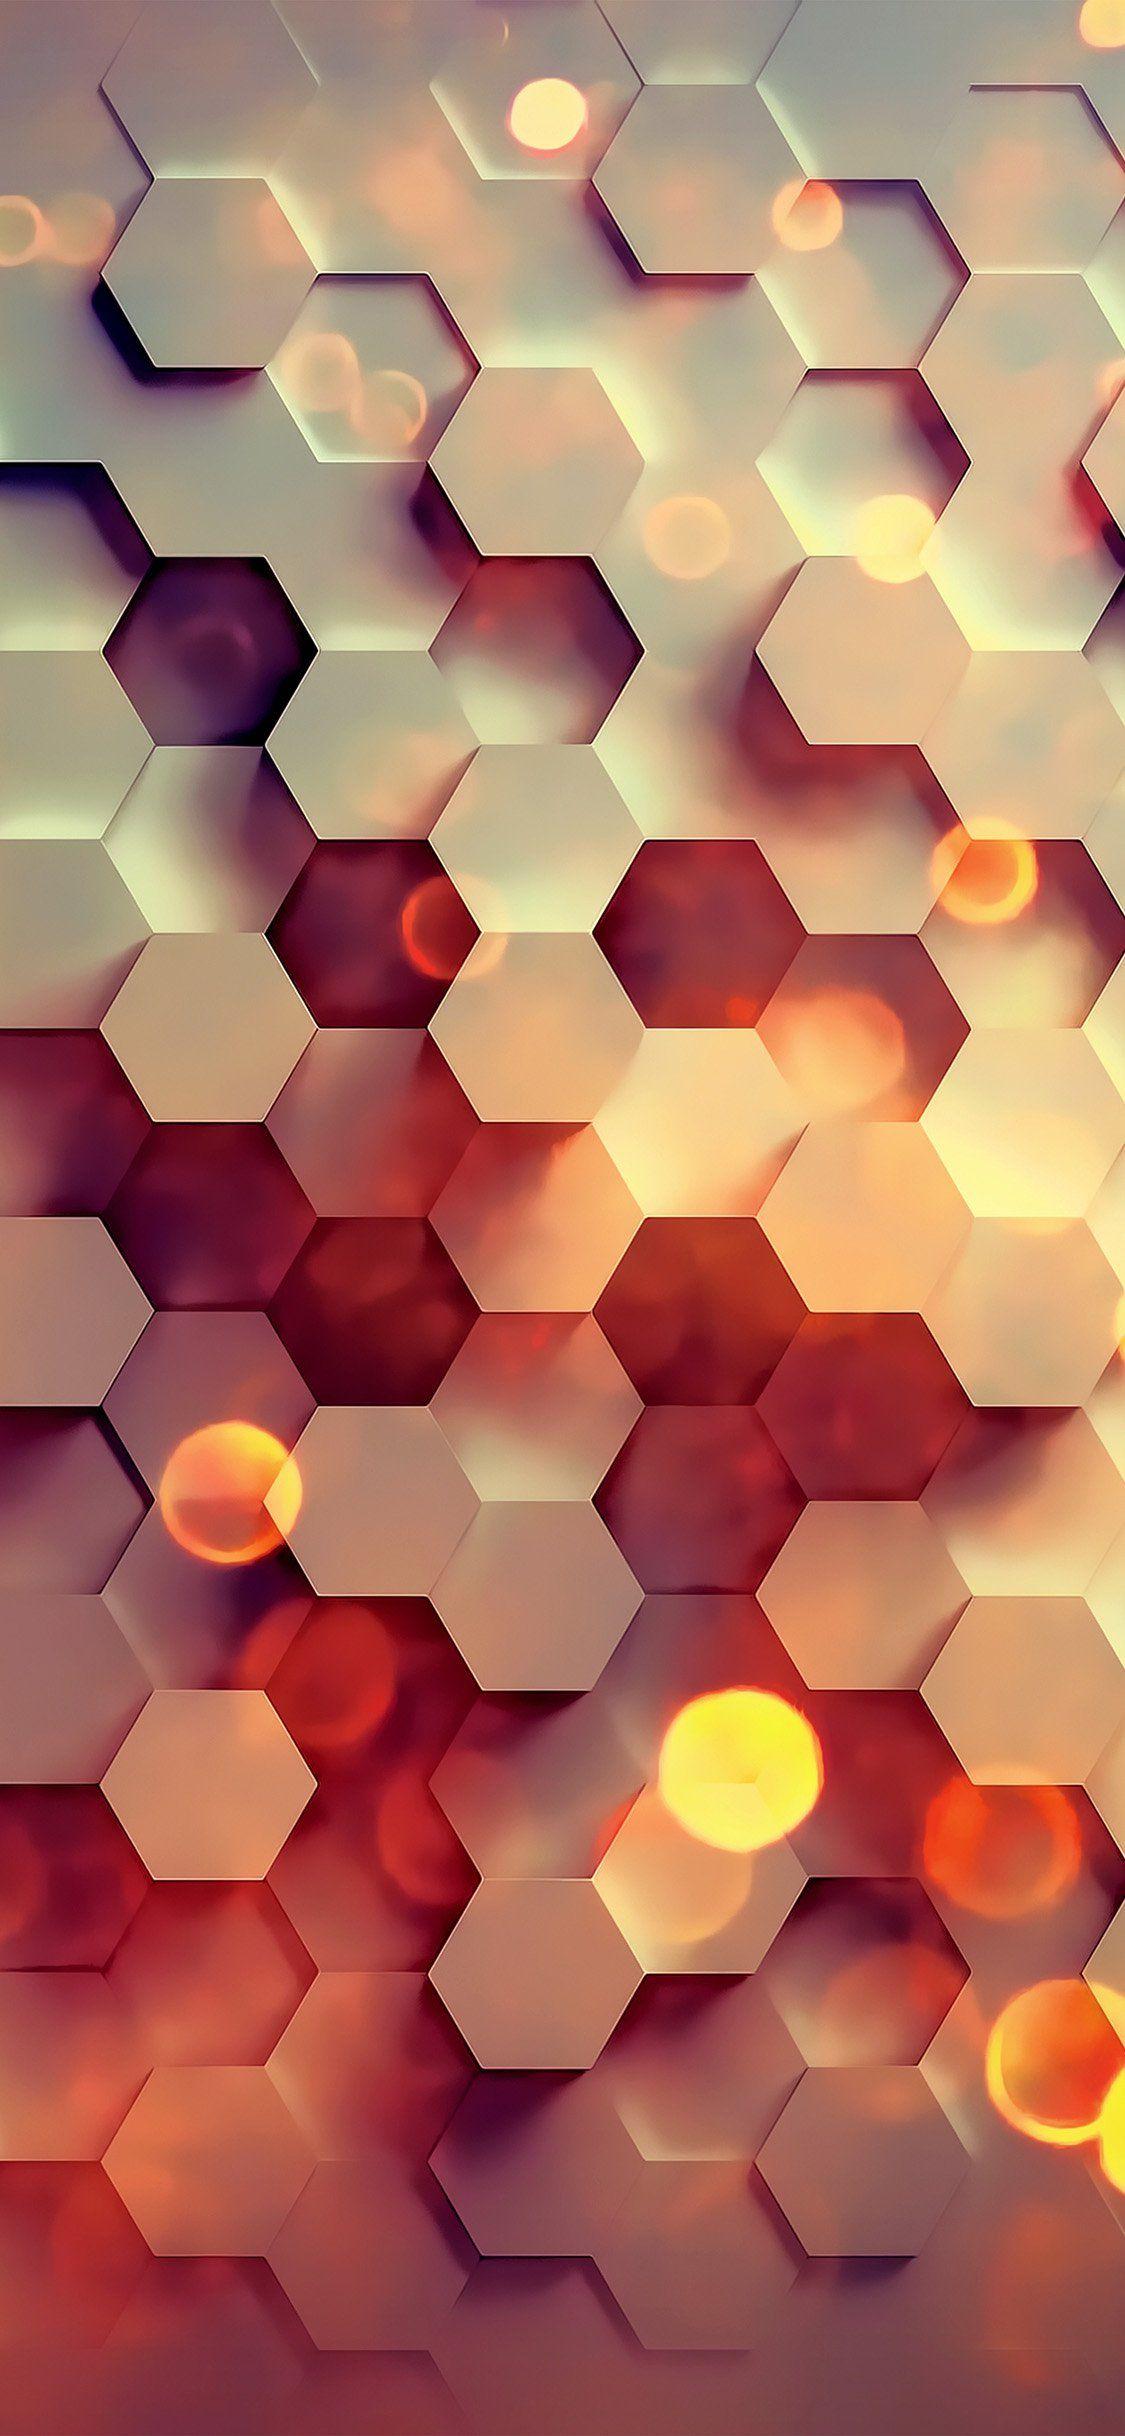 Amazing Iphone X Backgrounds Abstract Iphone Wallpaper Hexagon